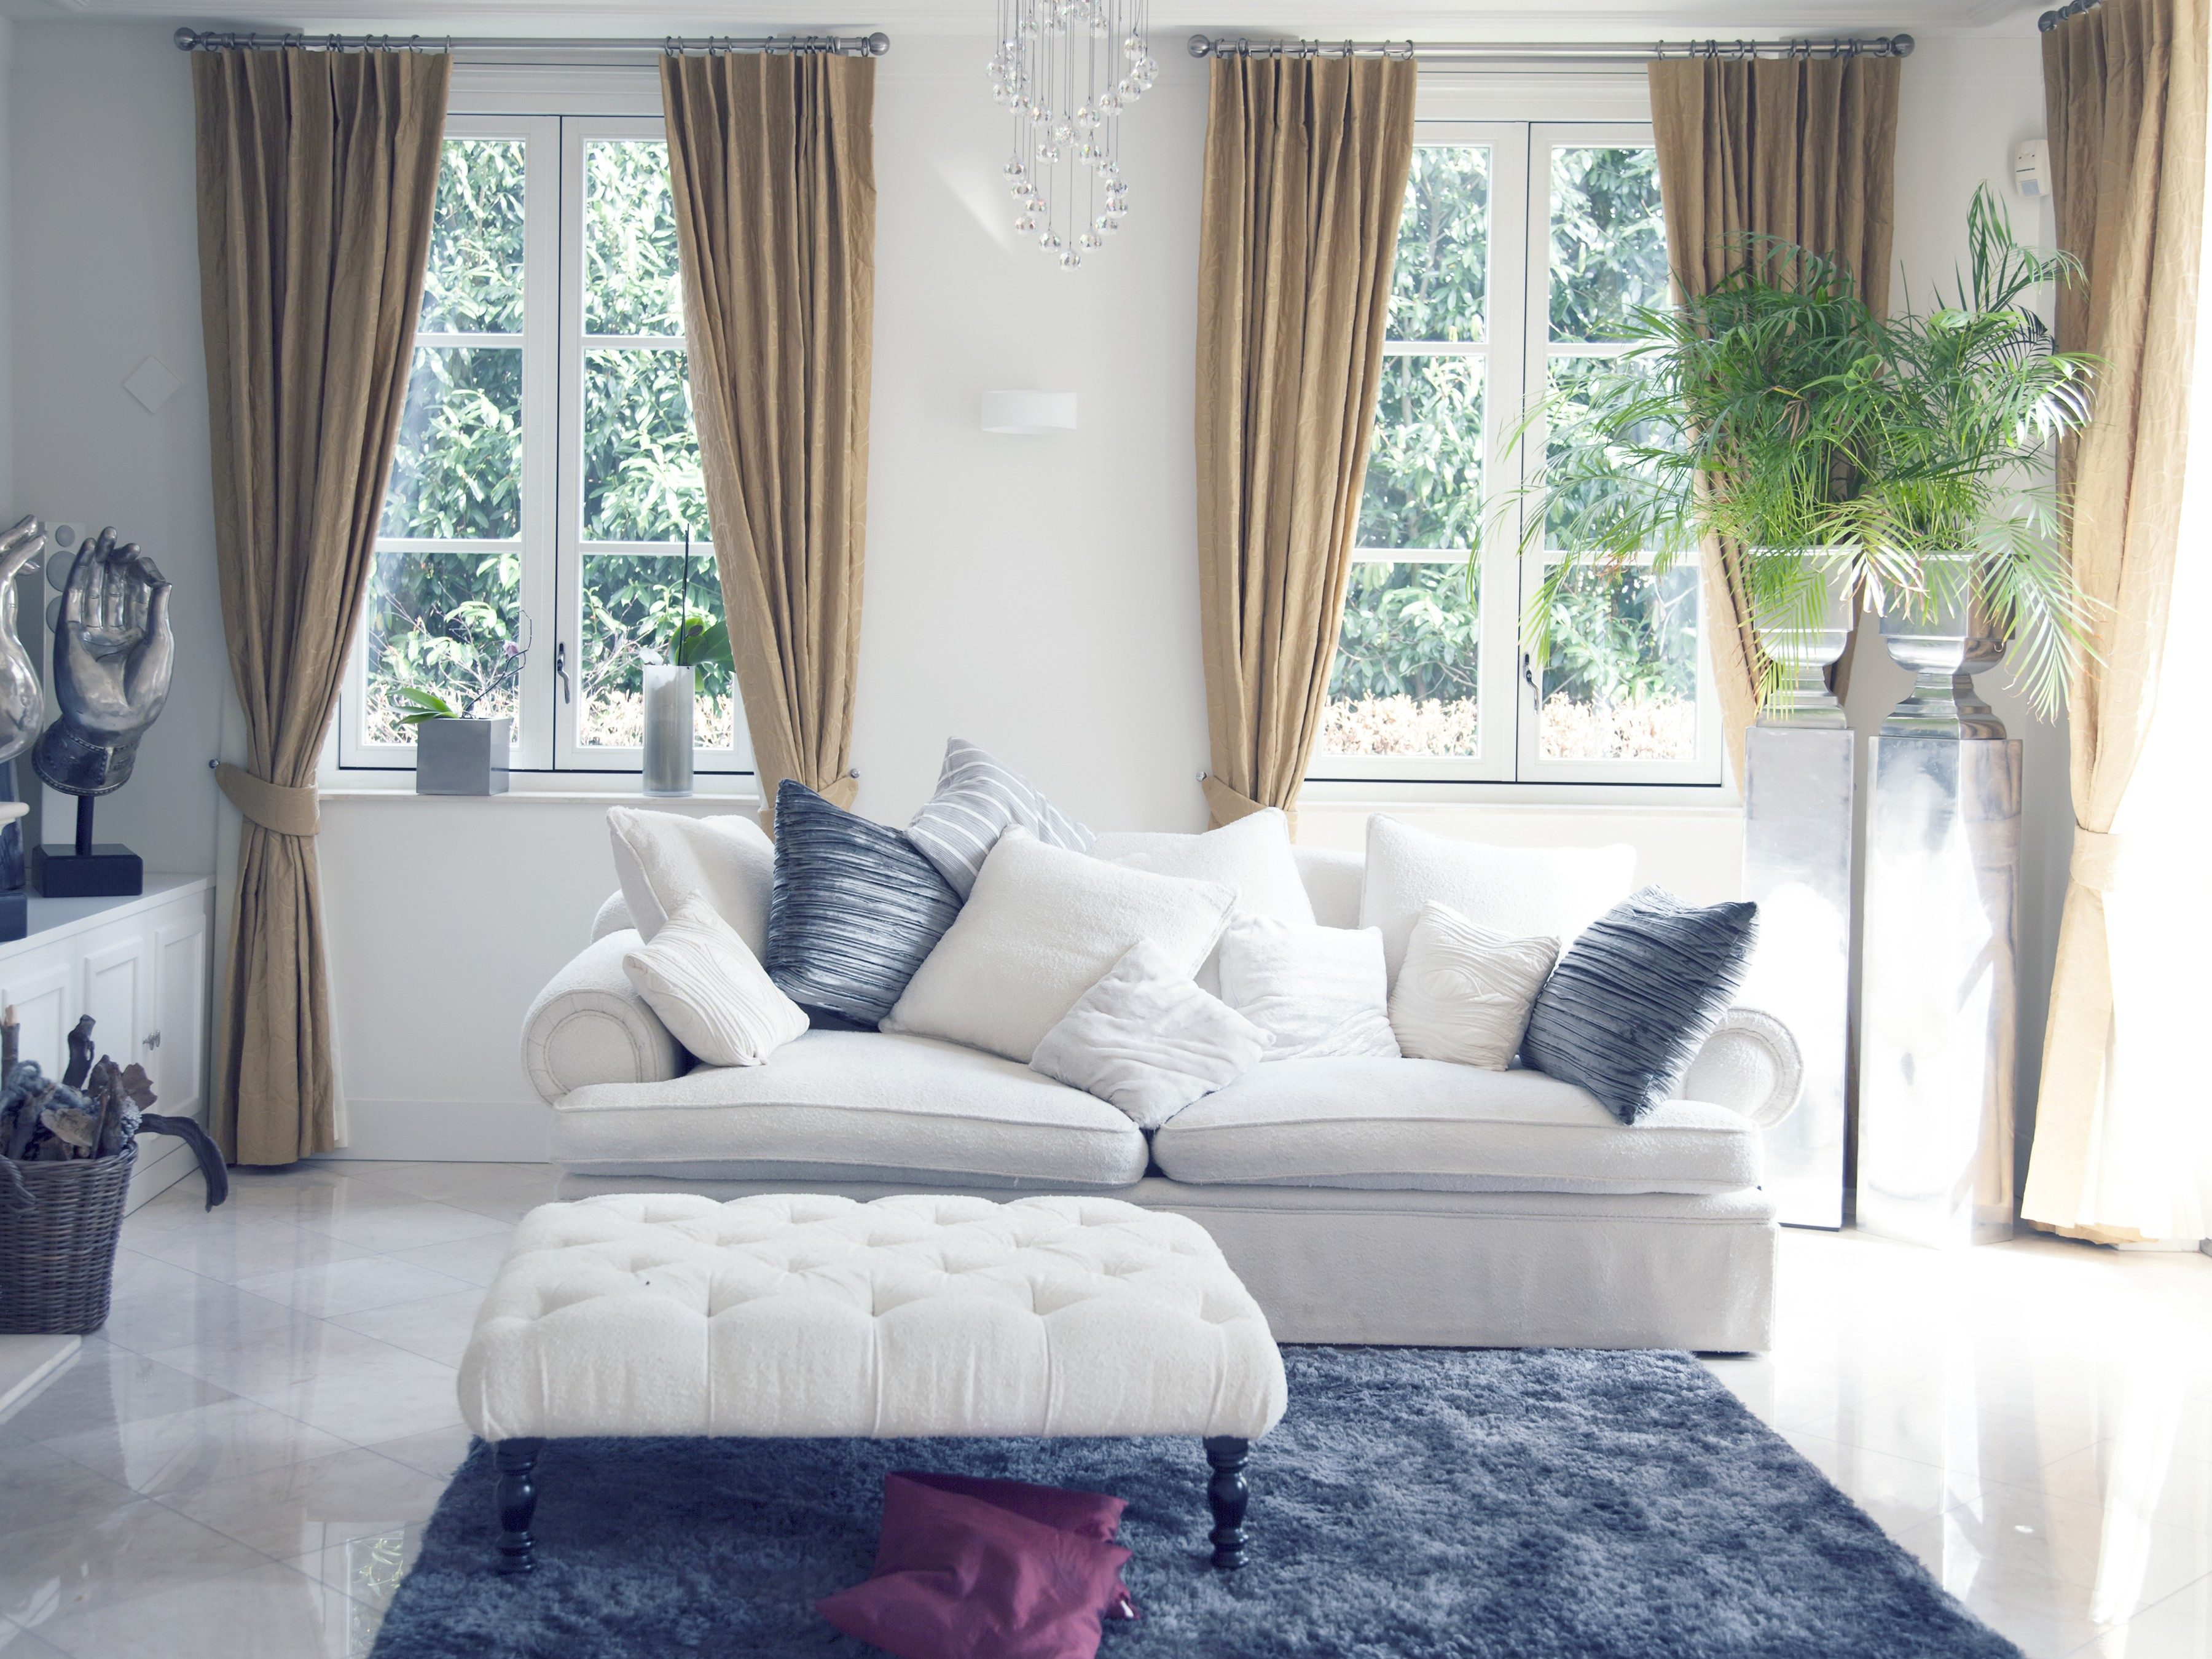 2. Rearrange the Family Room Furniture